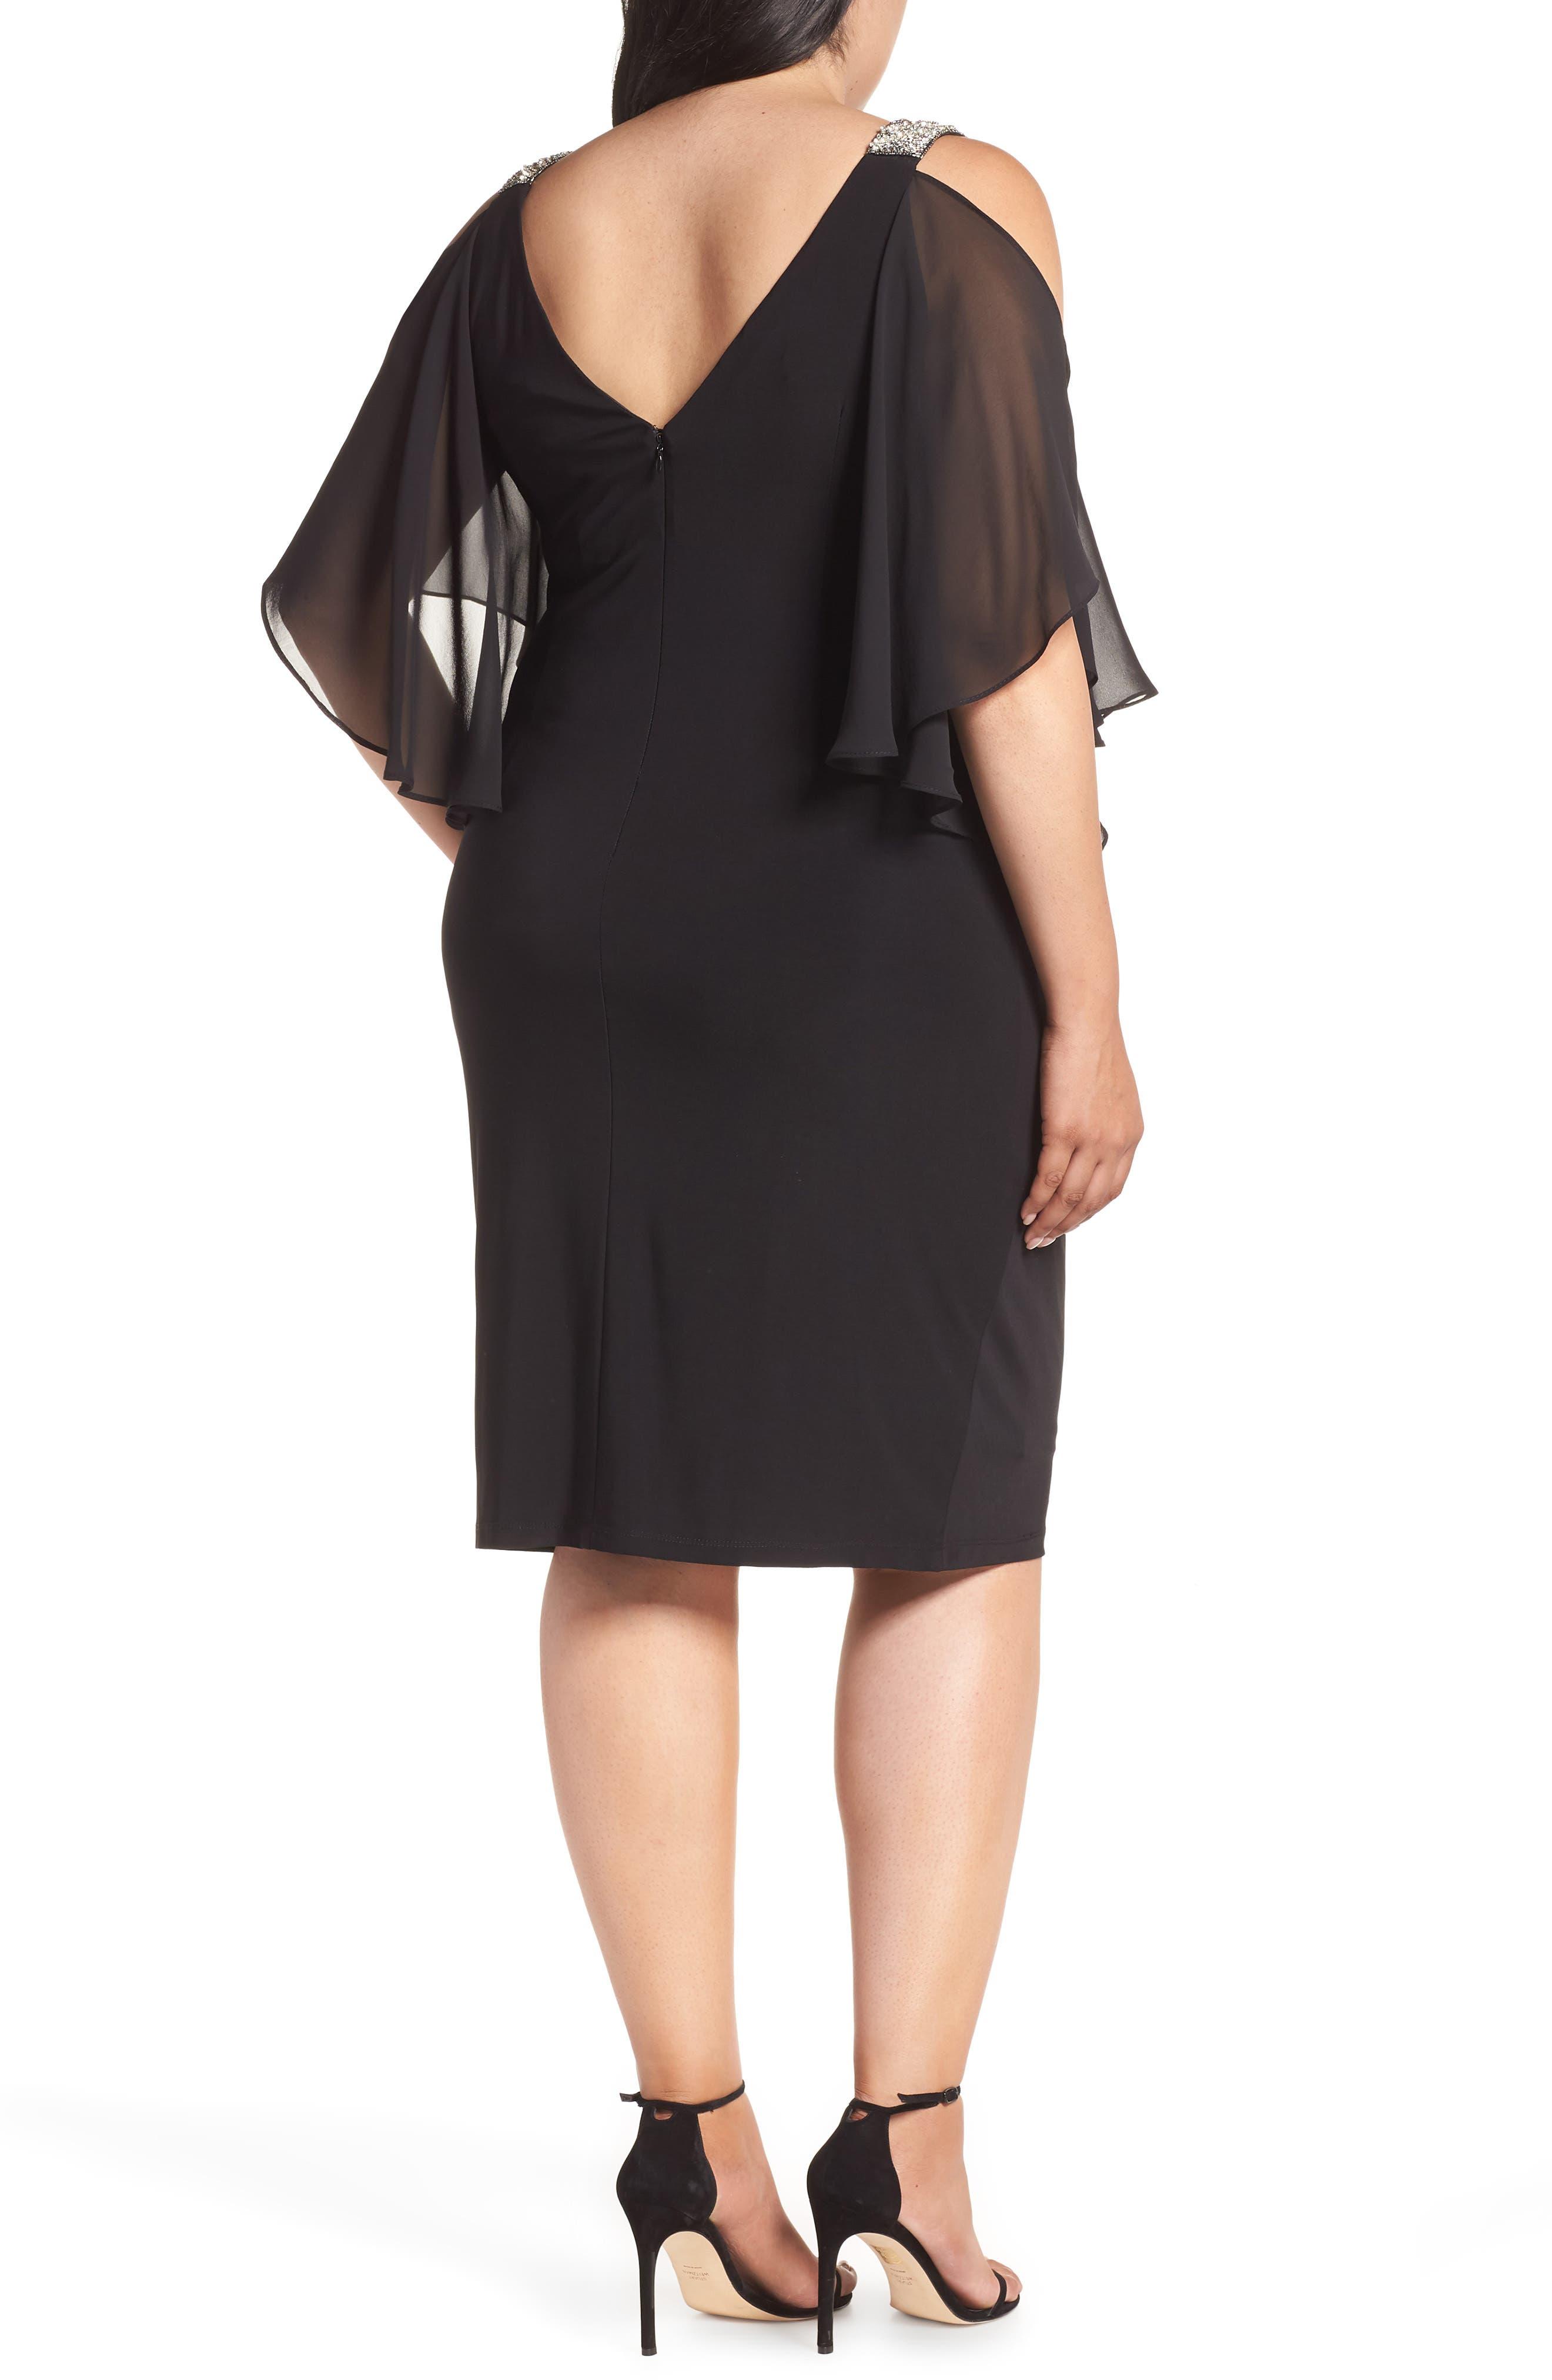 Cold Shoulder Sparkle Dress,                             Alternate thumbnail 2, color,                             BLACK/ SILVER